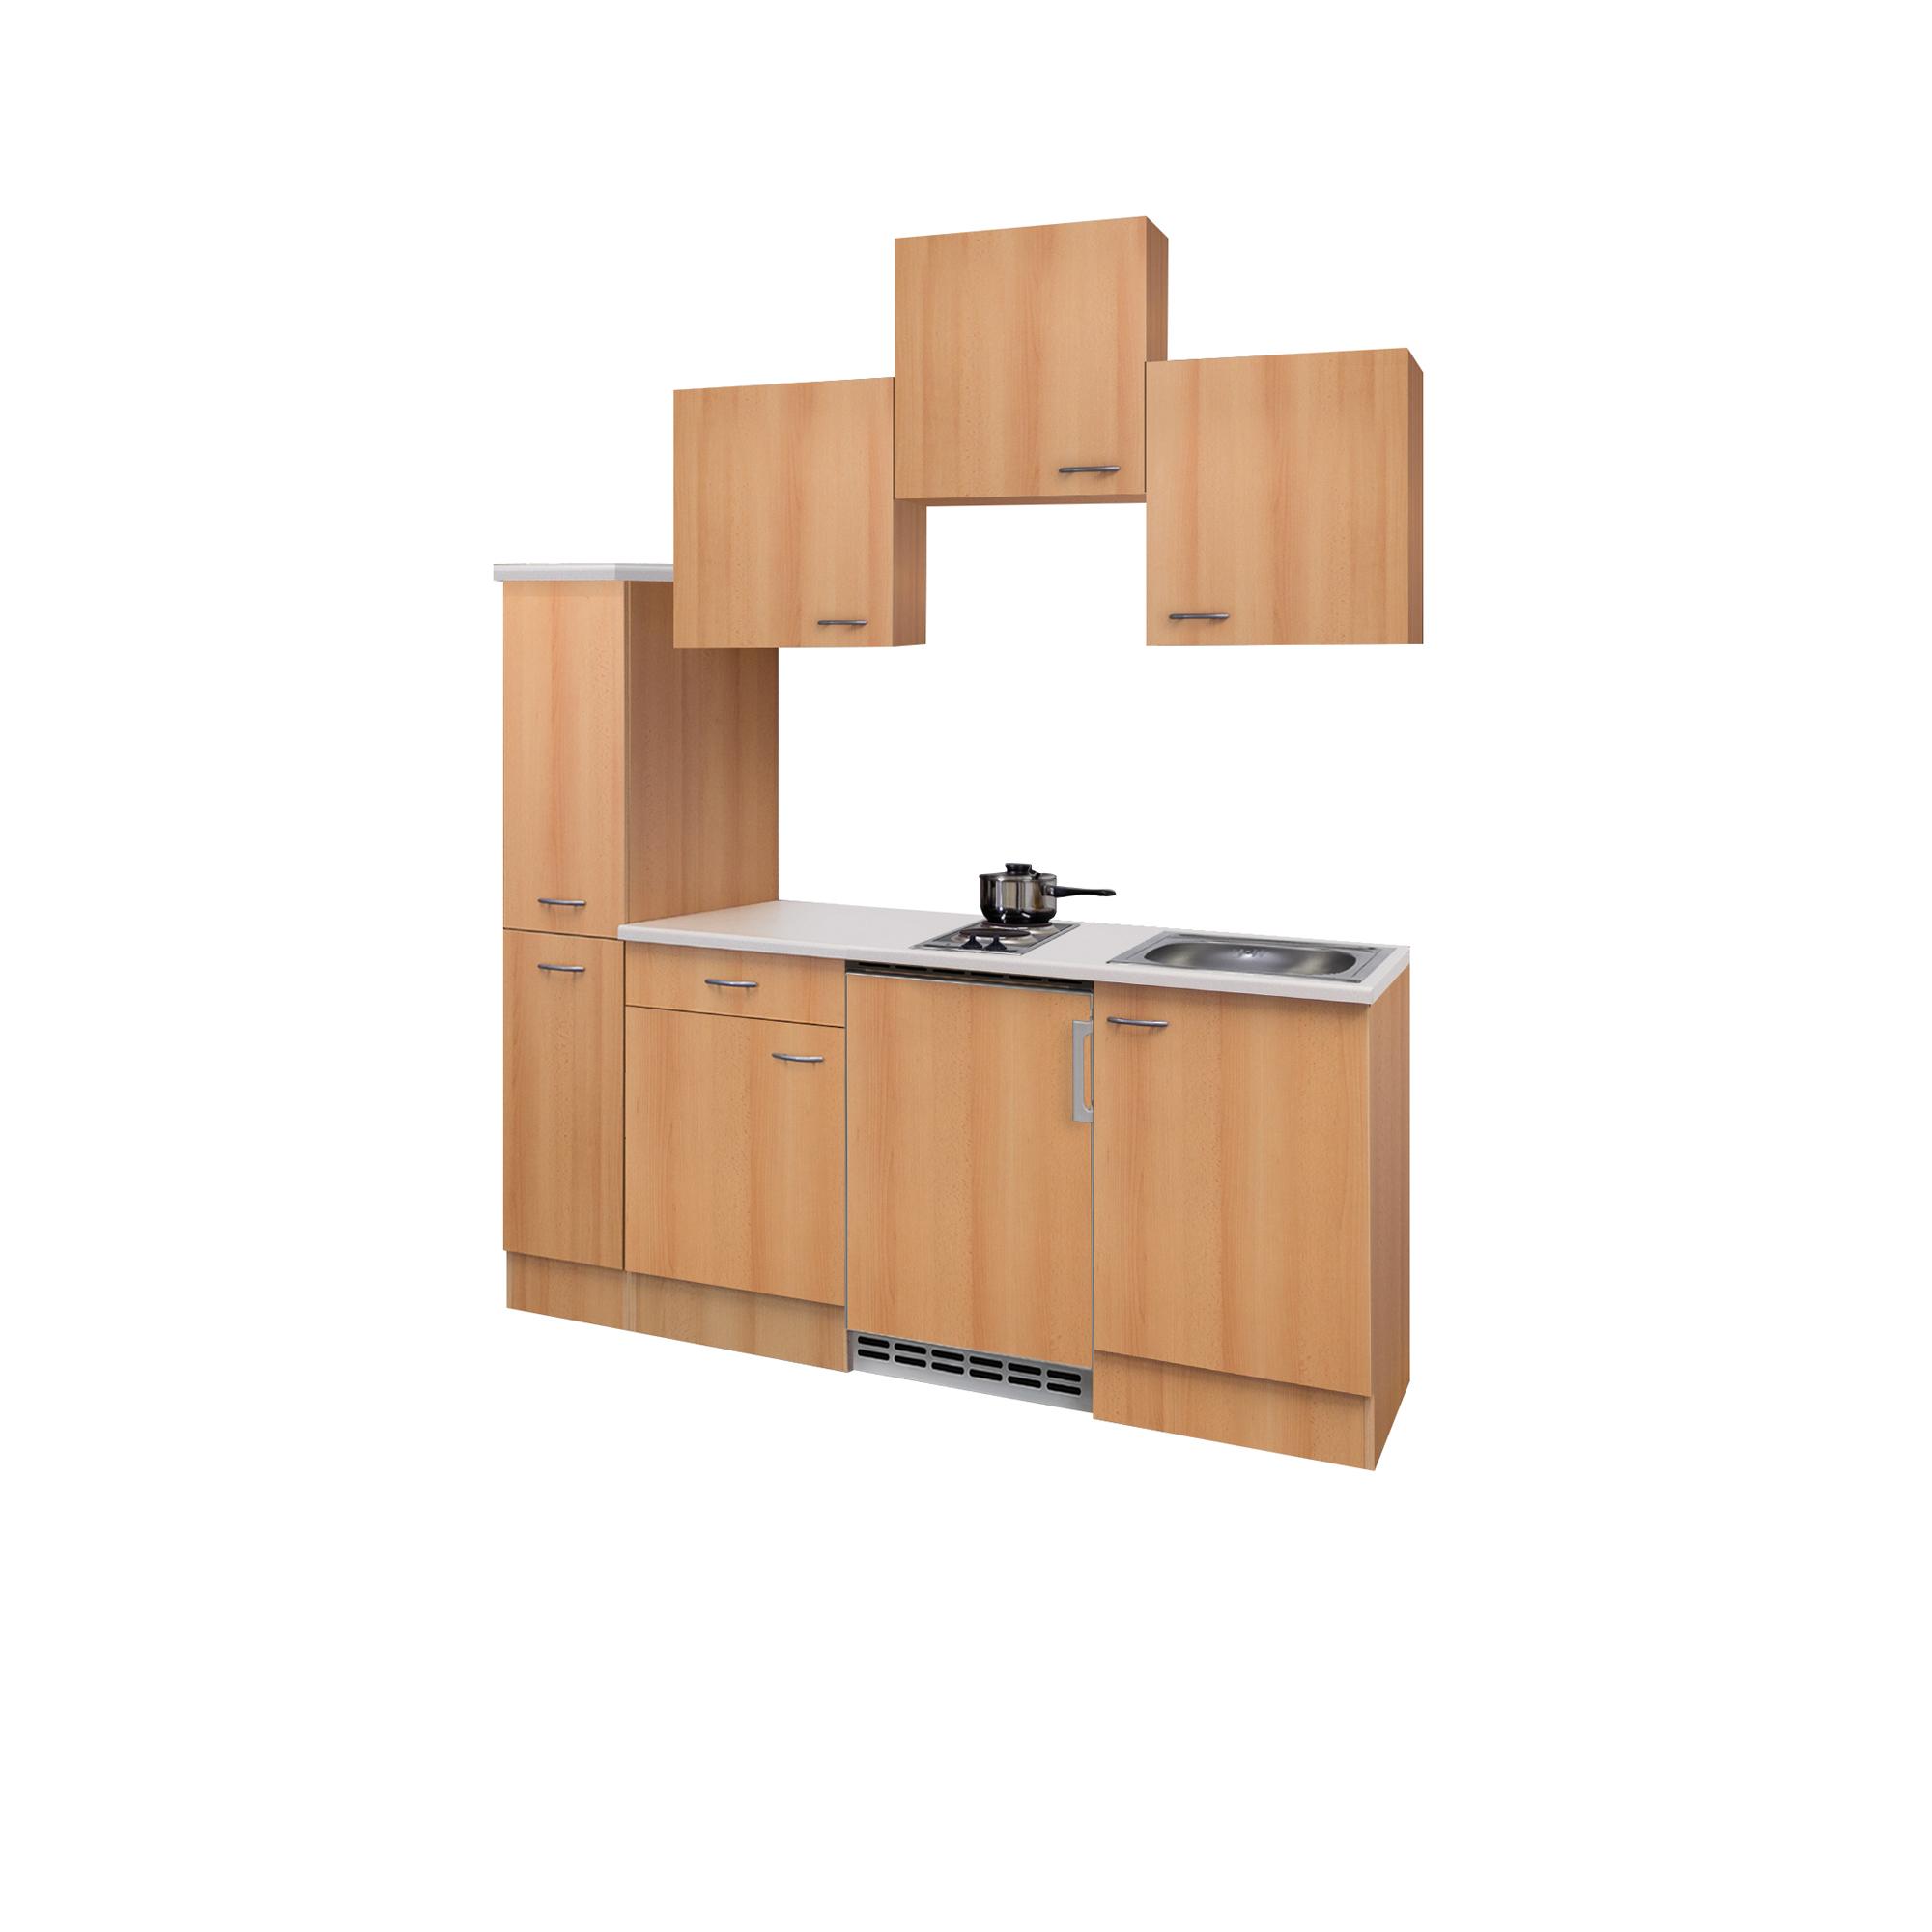 singlek che nano 10 teilig 180 cm breit buche k che singlek chen. Black Bedroom Furniture Sets. Home Design Ideas